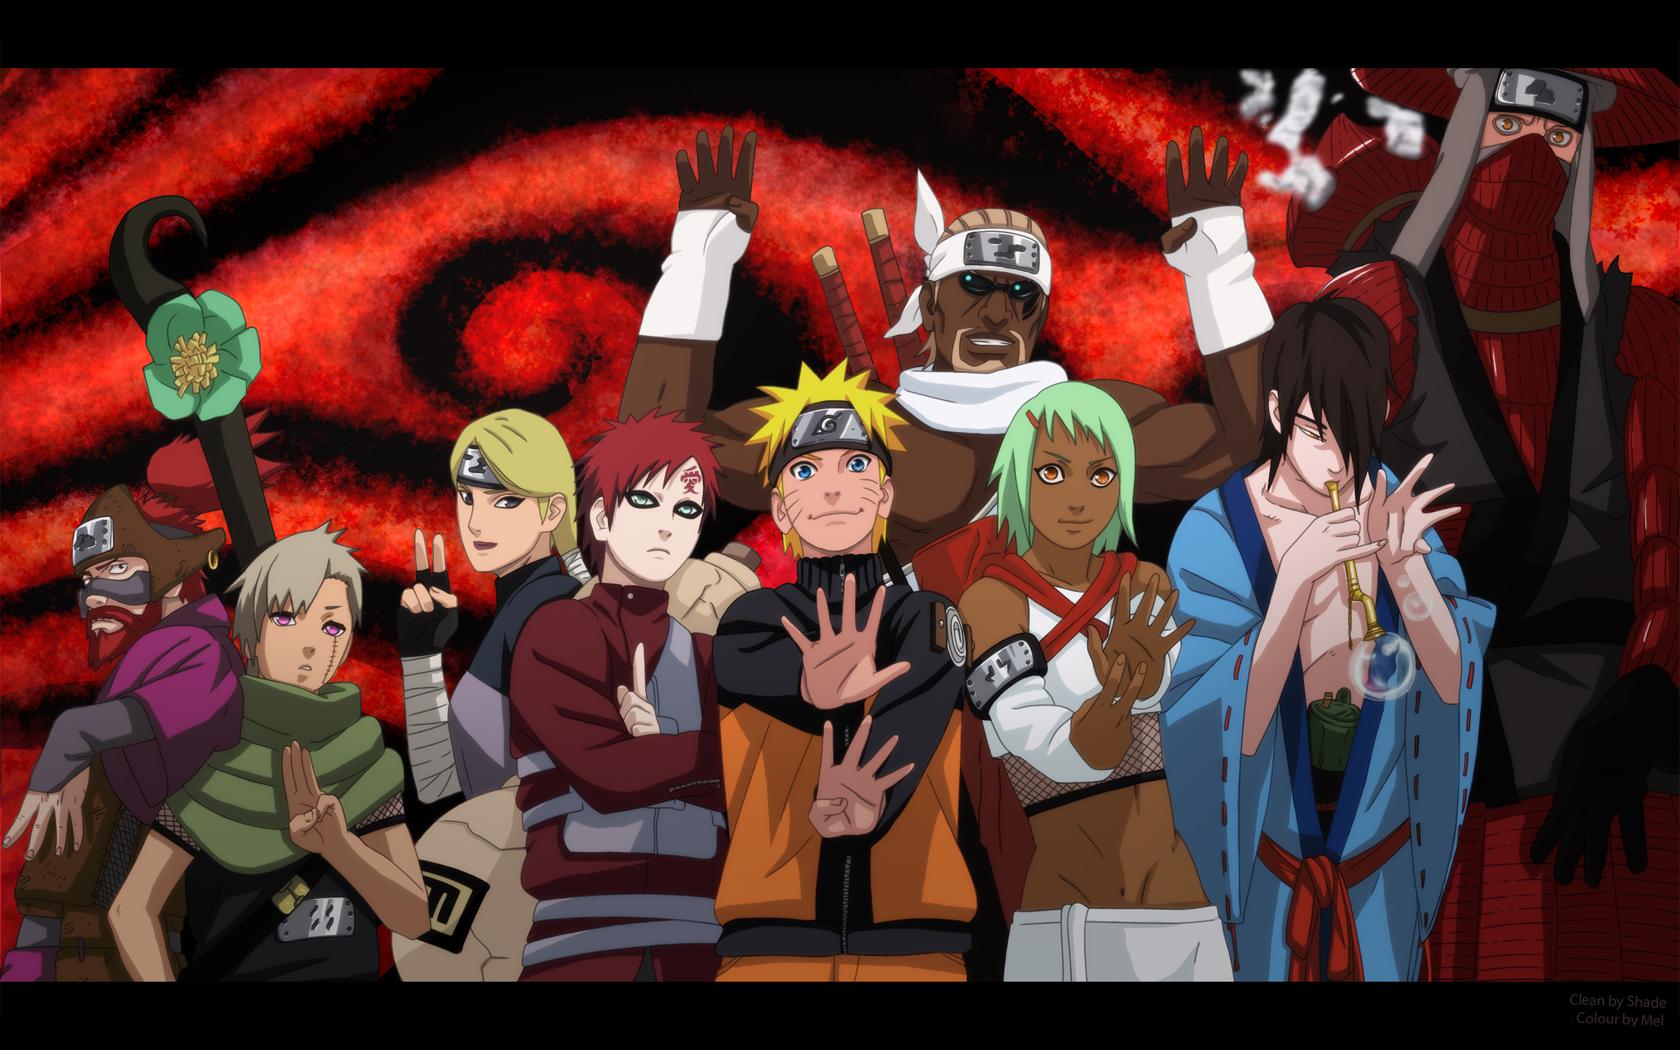 Top Wallpaper Naruto Original - Download-Wallpapers-Naruto-Shippuden-061  Trends_986920.jpg